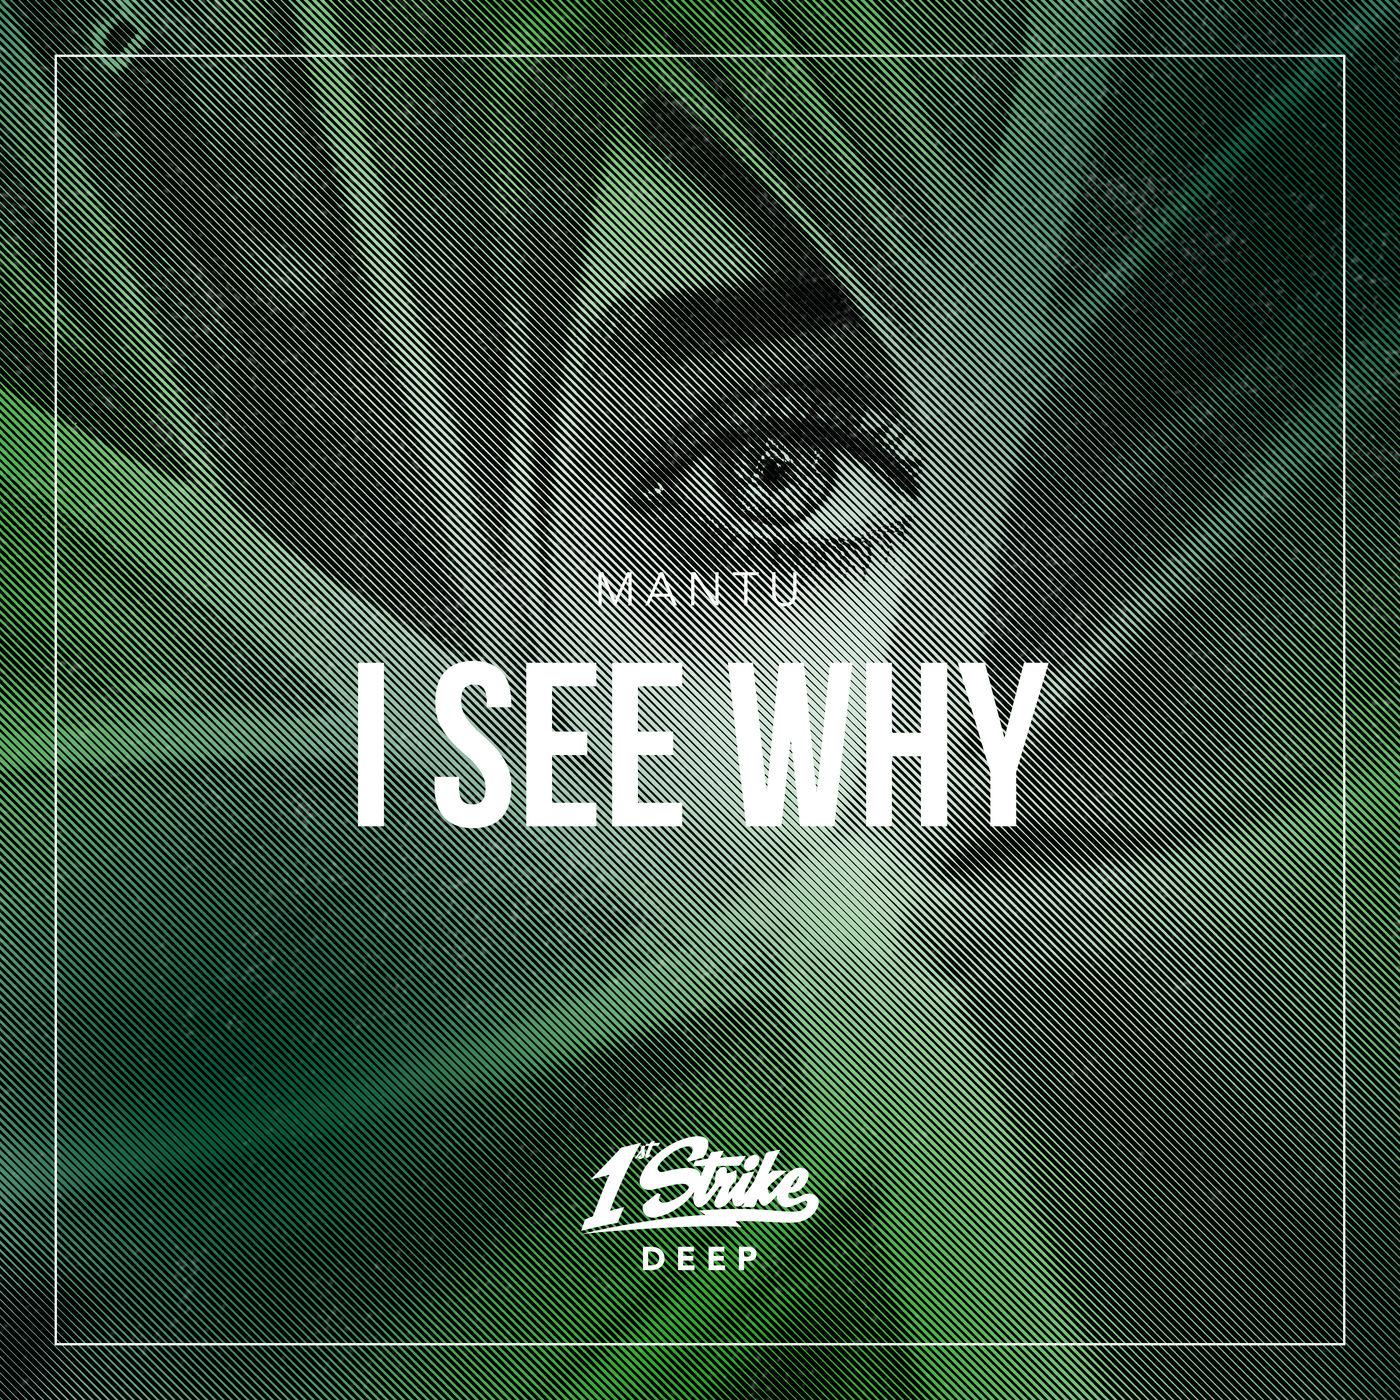 Mantu, Sasha Perera - I See Why  (Extended Mix)